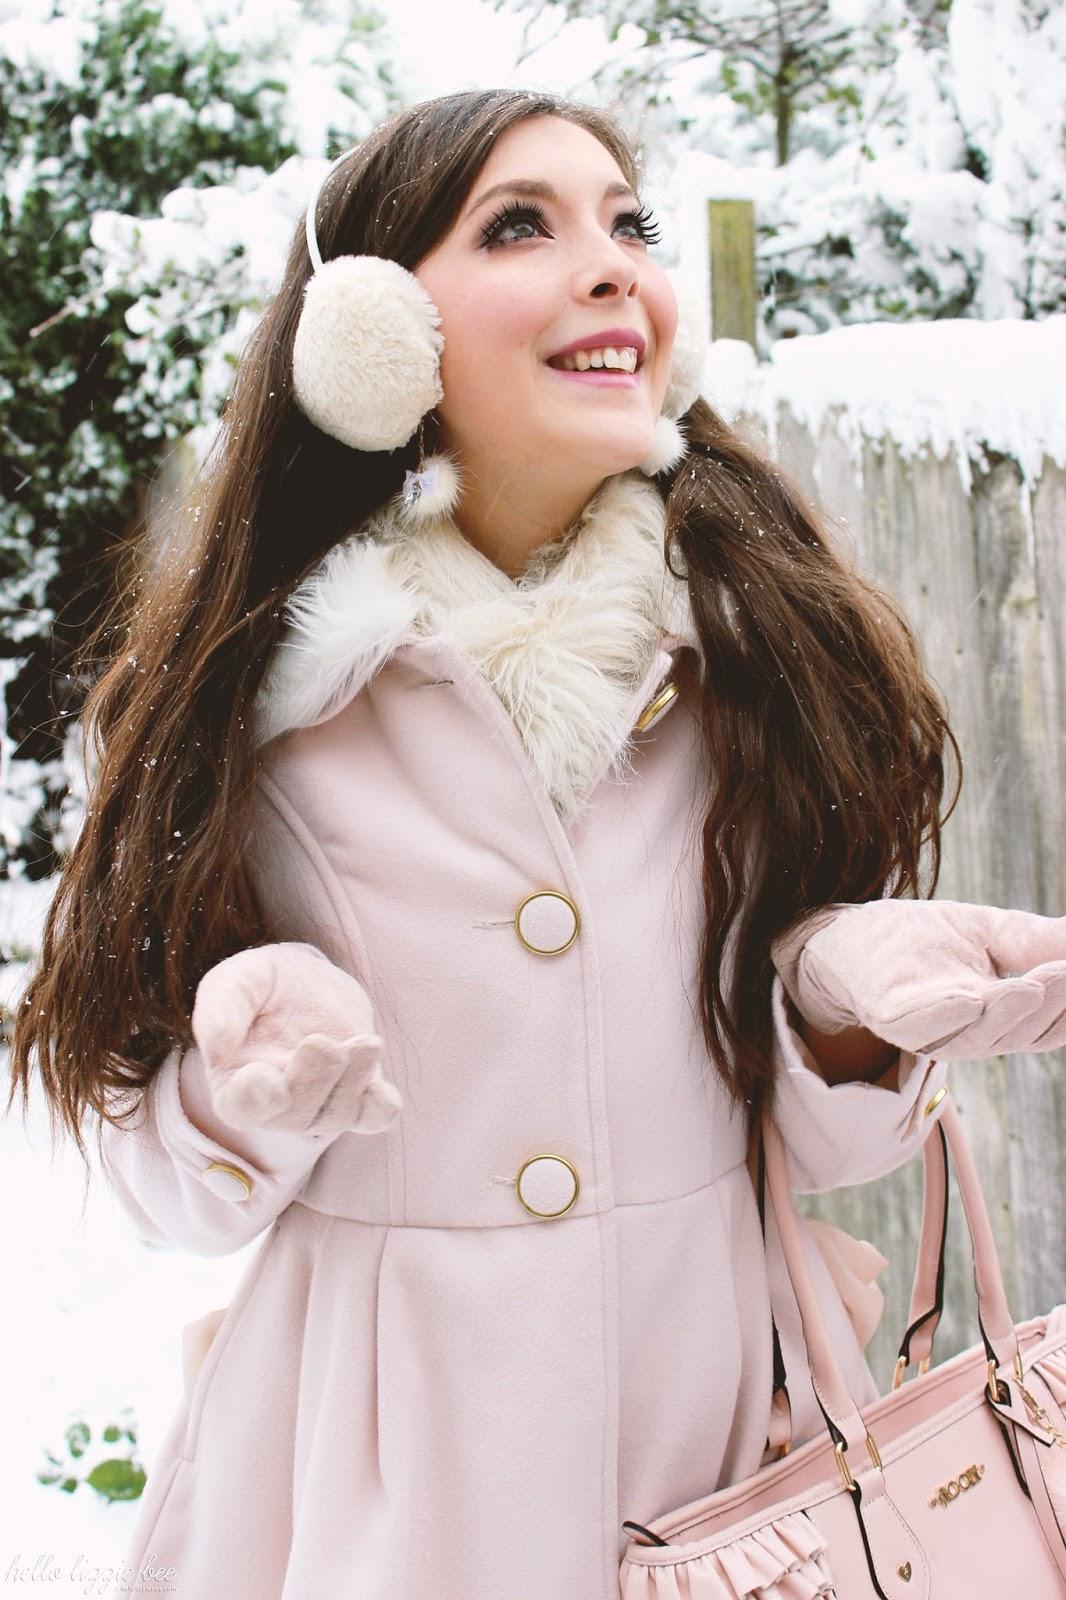 Snowy himekaji outfit